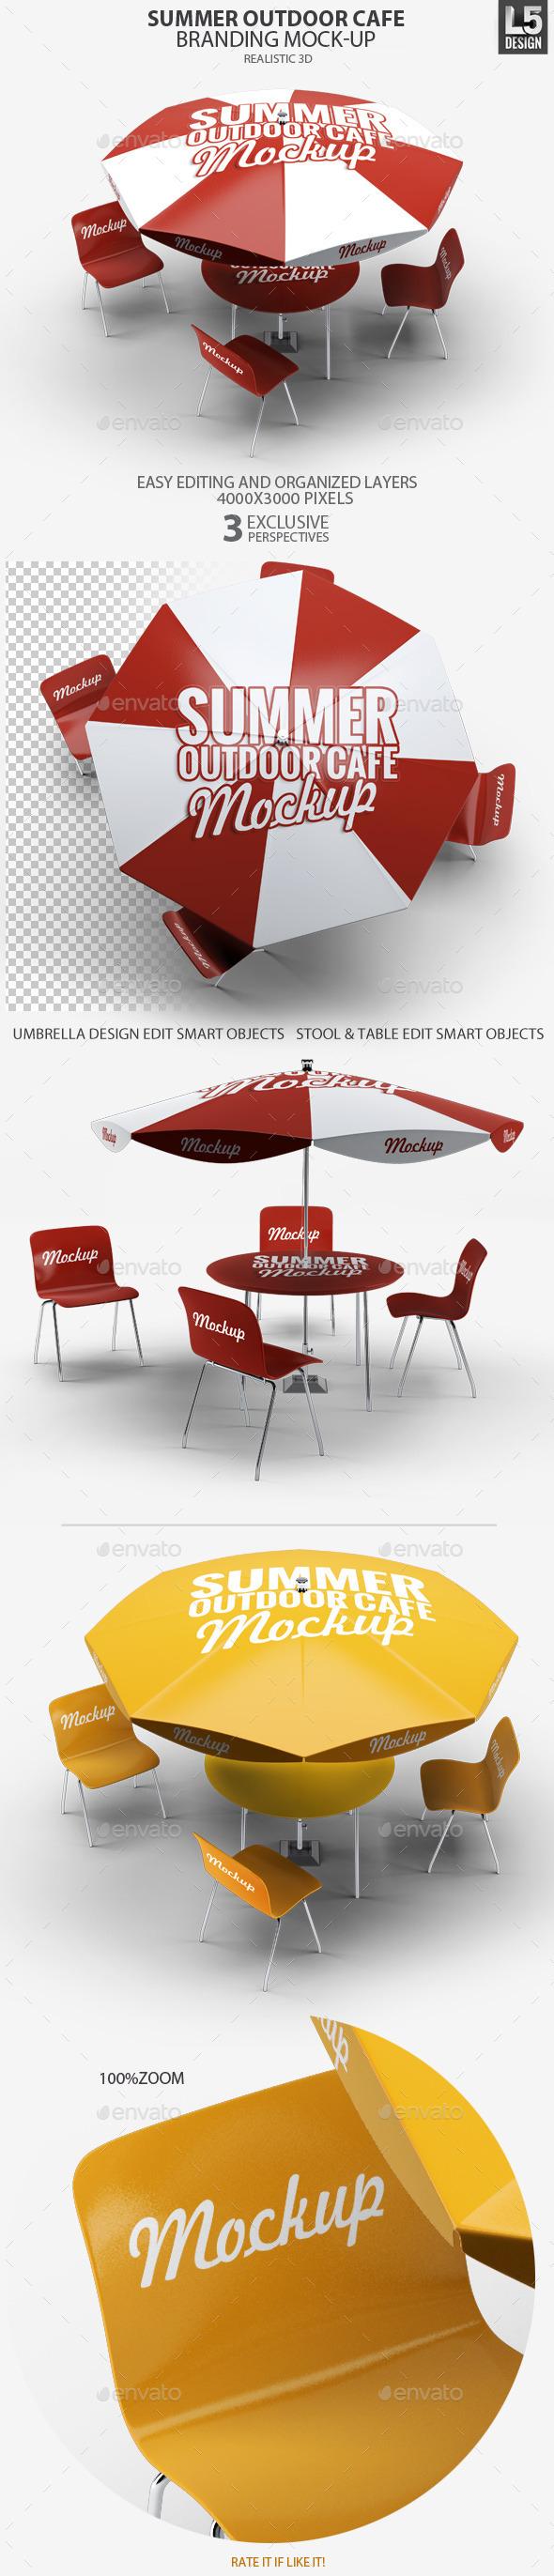 GraphicRiver Summer Outdoor Cafe Branding Mock-Up 10633581